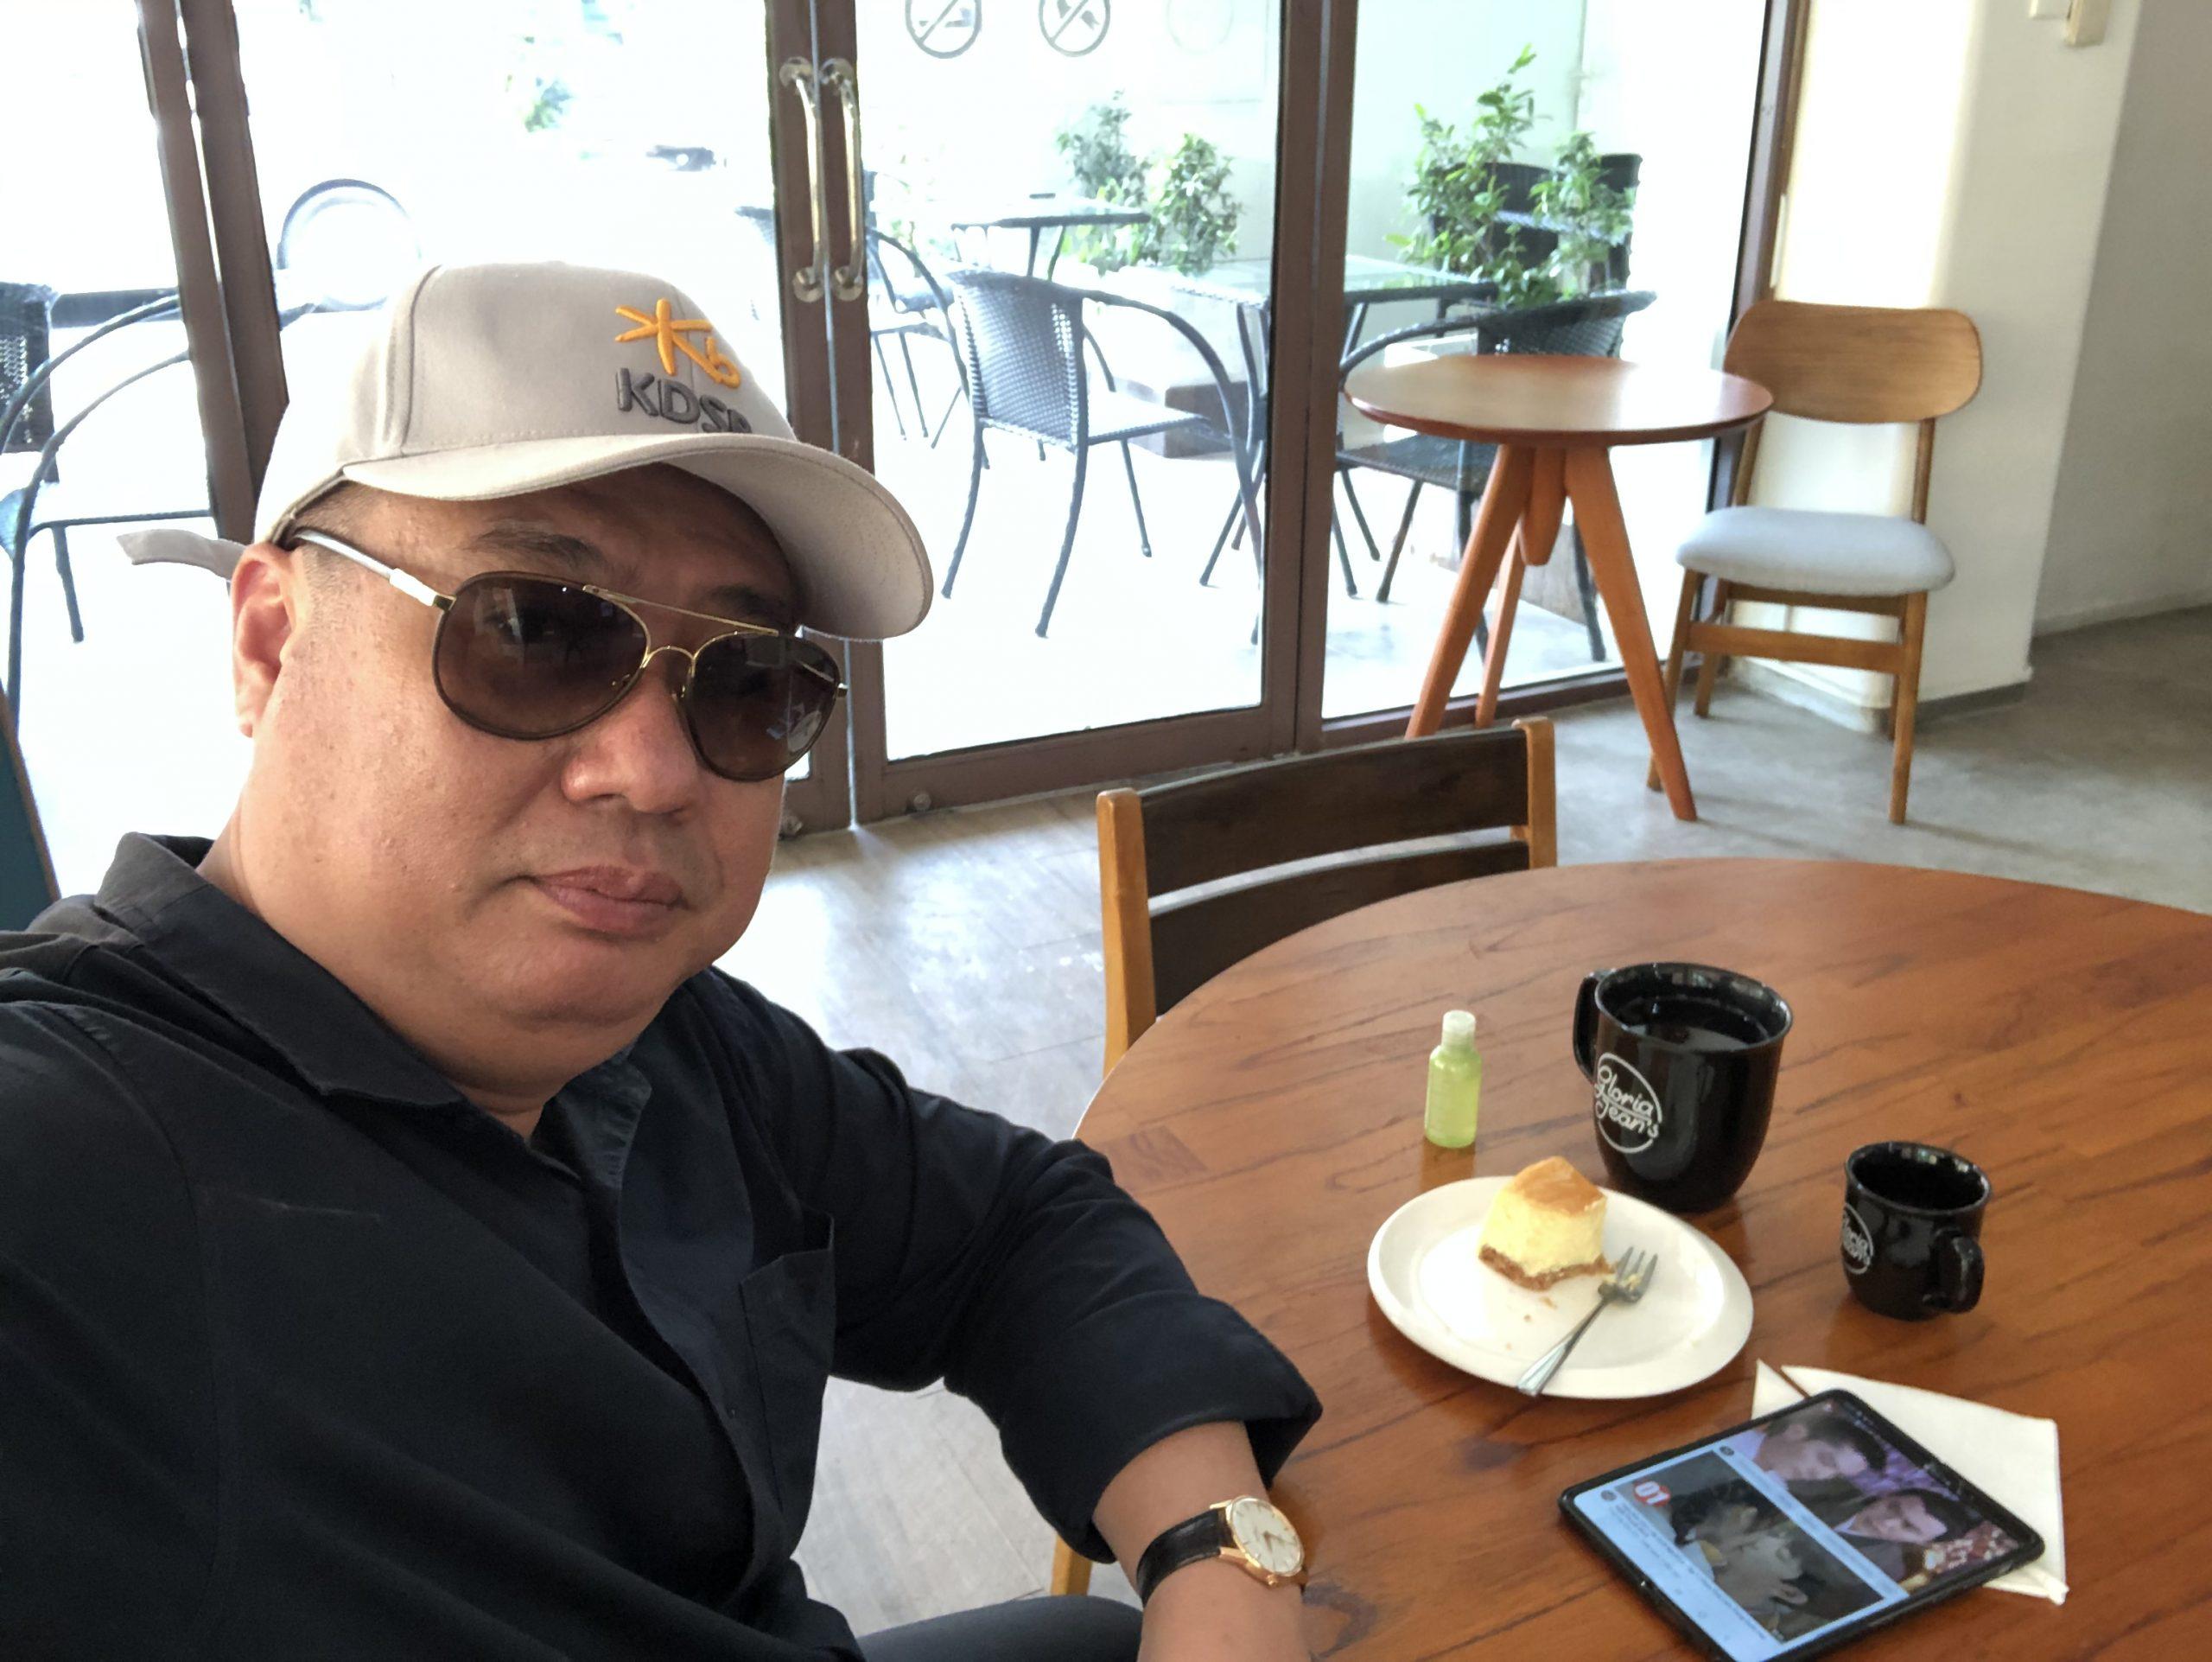 Tonghai Oeng